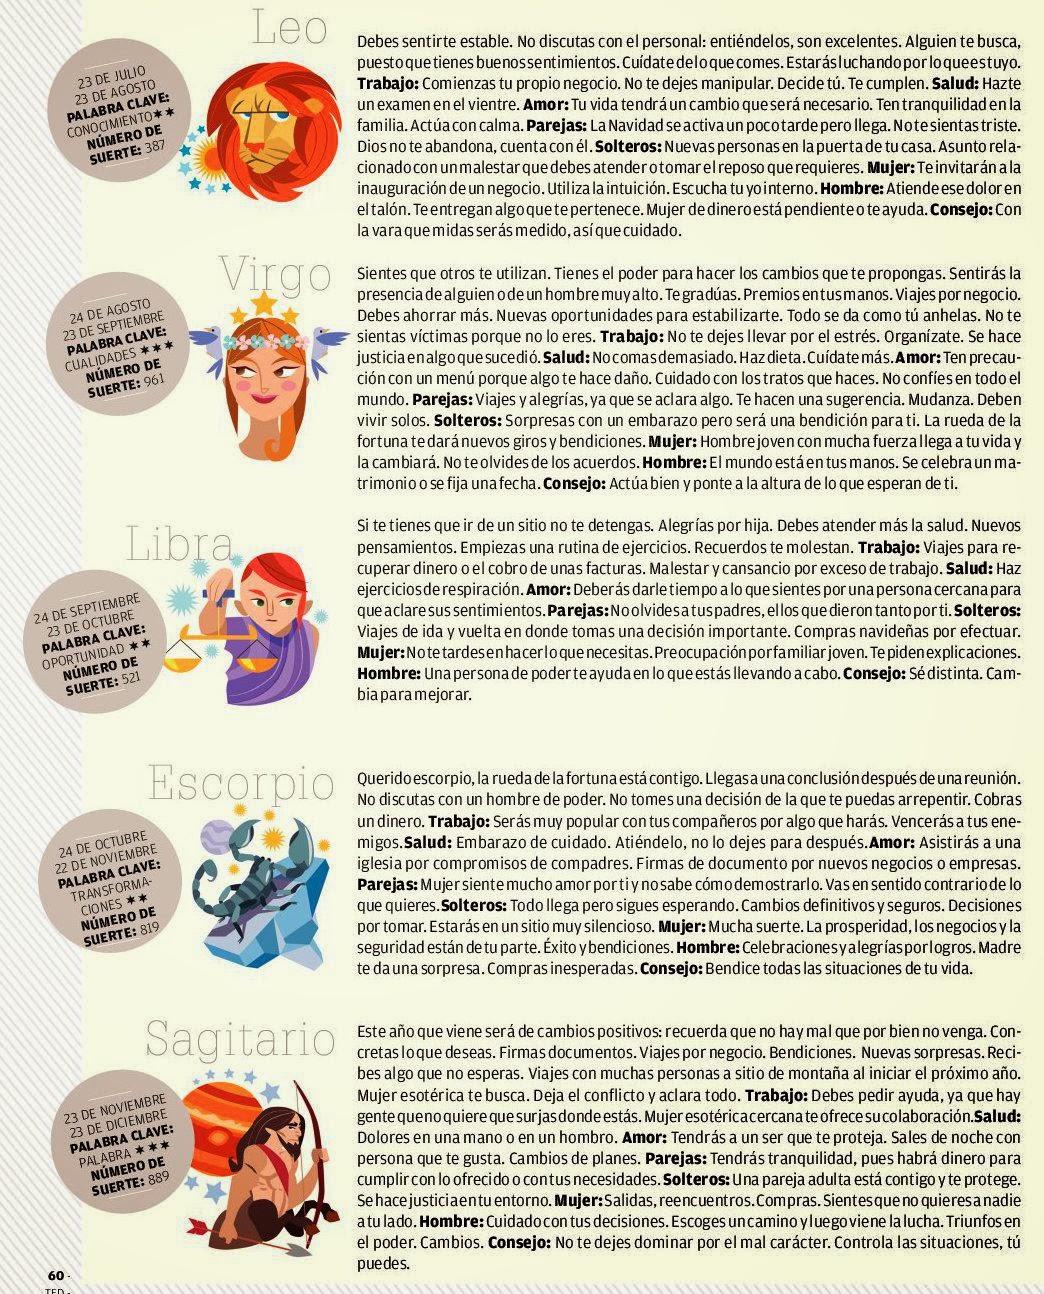 20131208 TODO1 60 1 G1 Horóscopo por Adriana Azzi Sedes